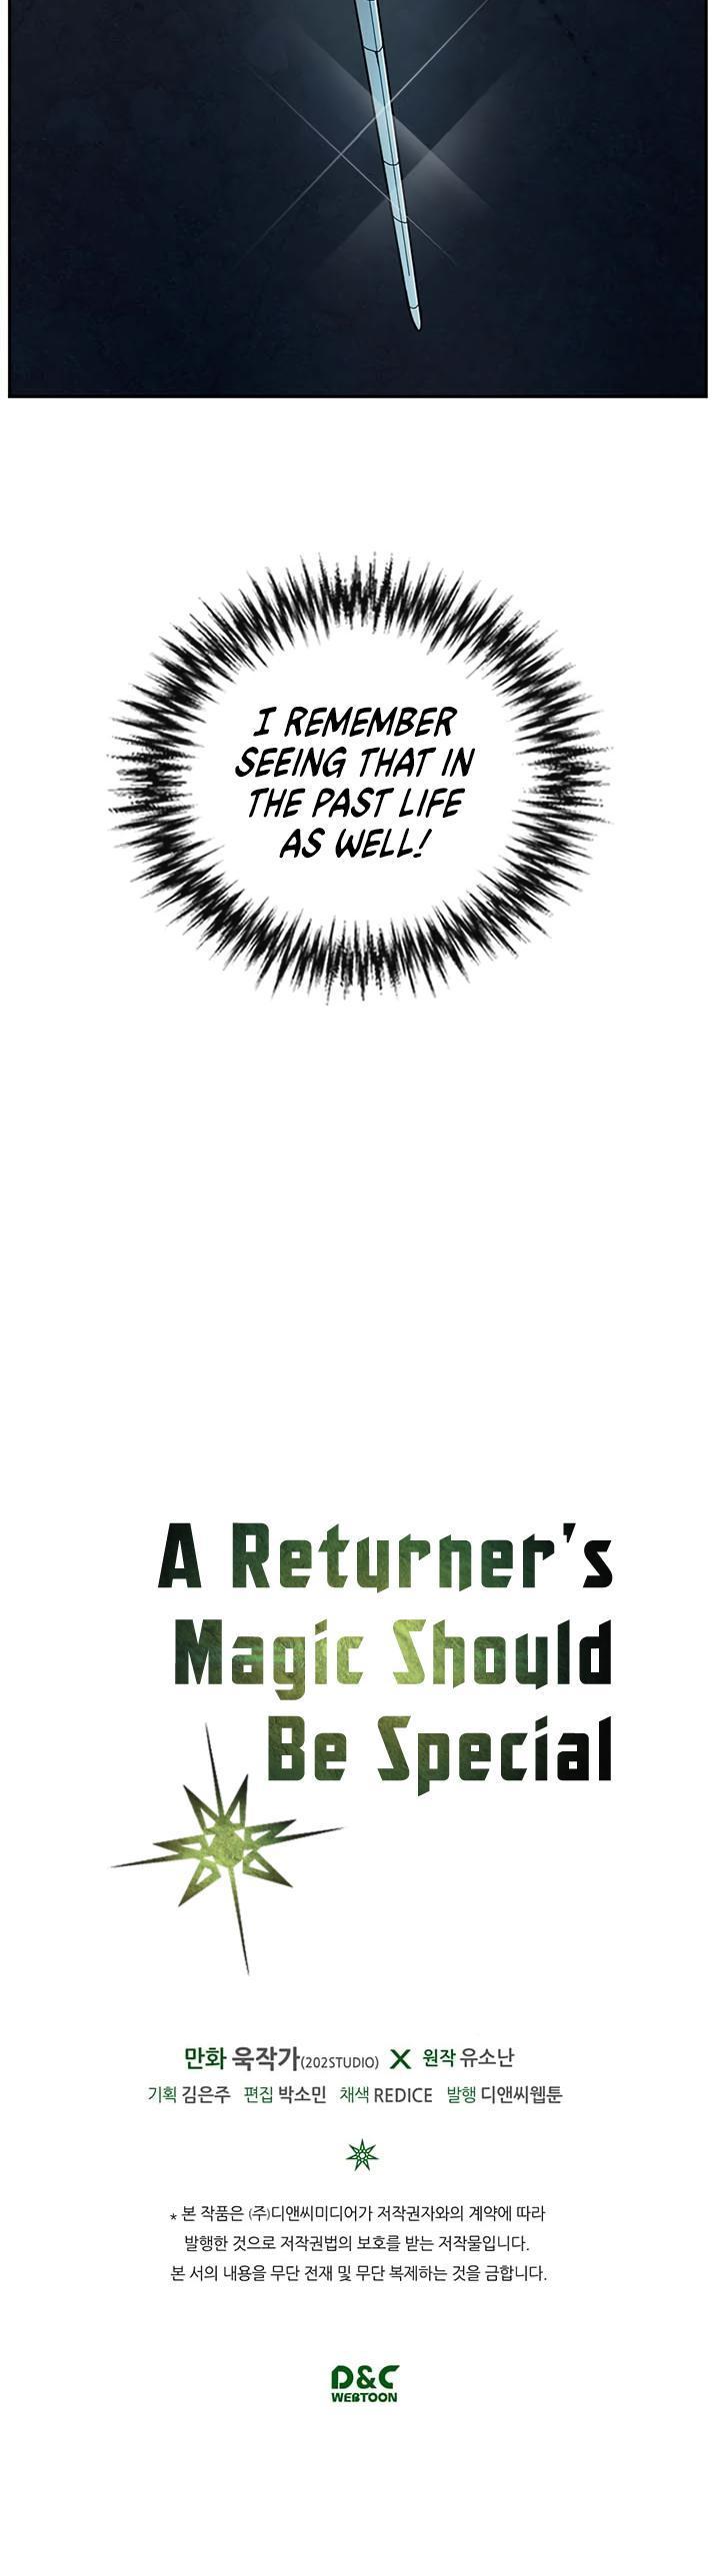 A Returner's Magic Should Be Special Chapter 17 page 26 - Mangakakalots.com